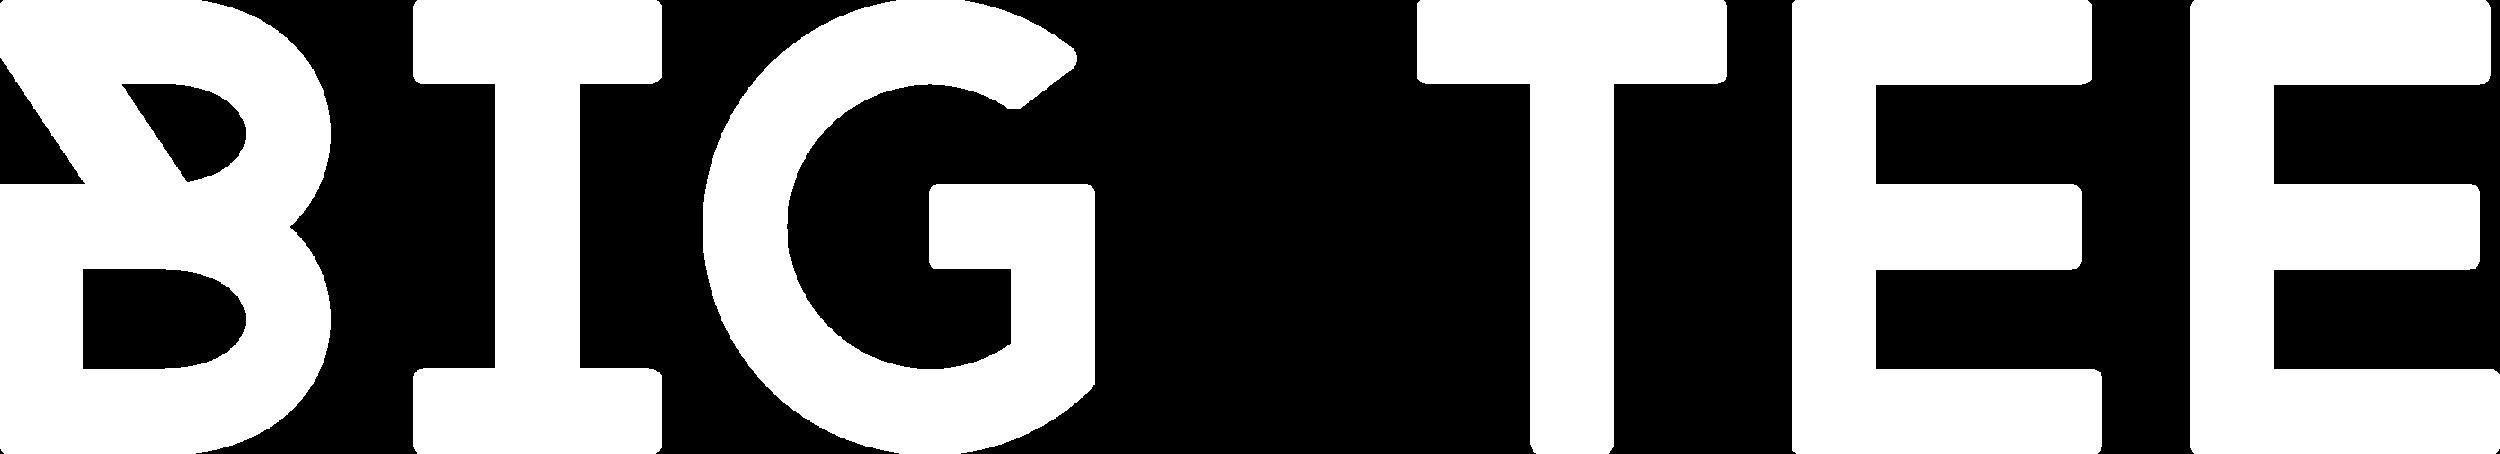 big-tee-logo.png